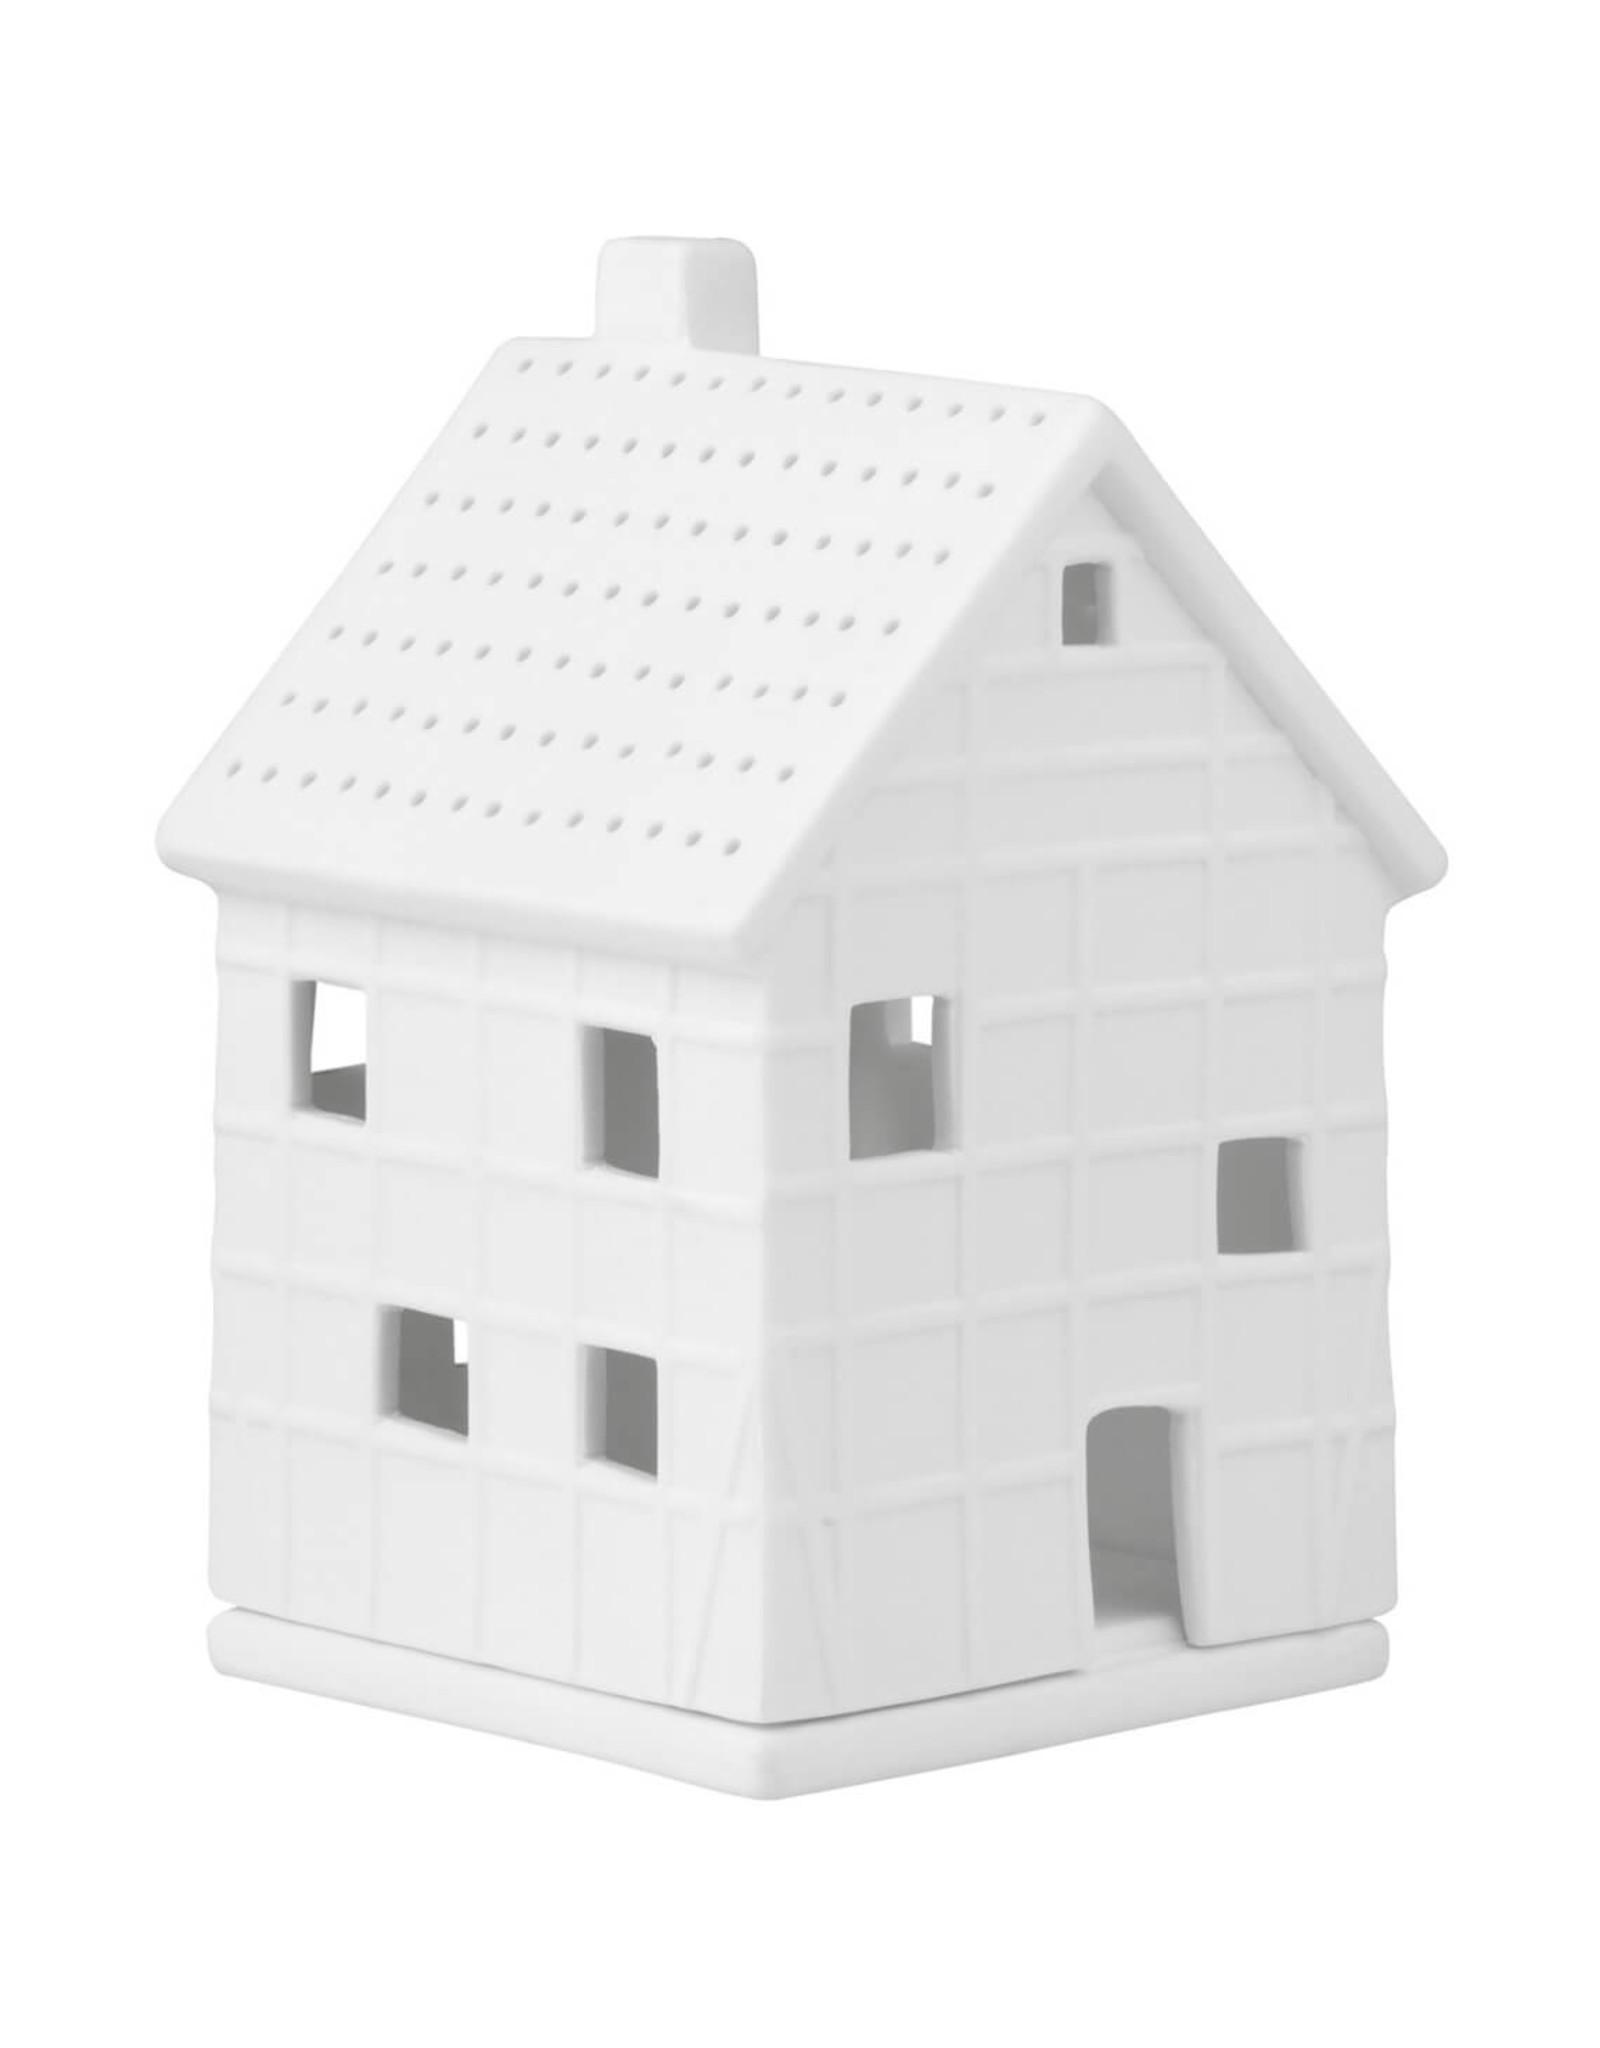 Raeder Lichthuis - S - Houten Huisje - 7 x 7 x 12cm